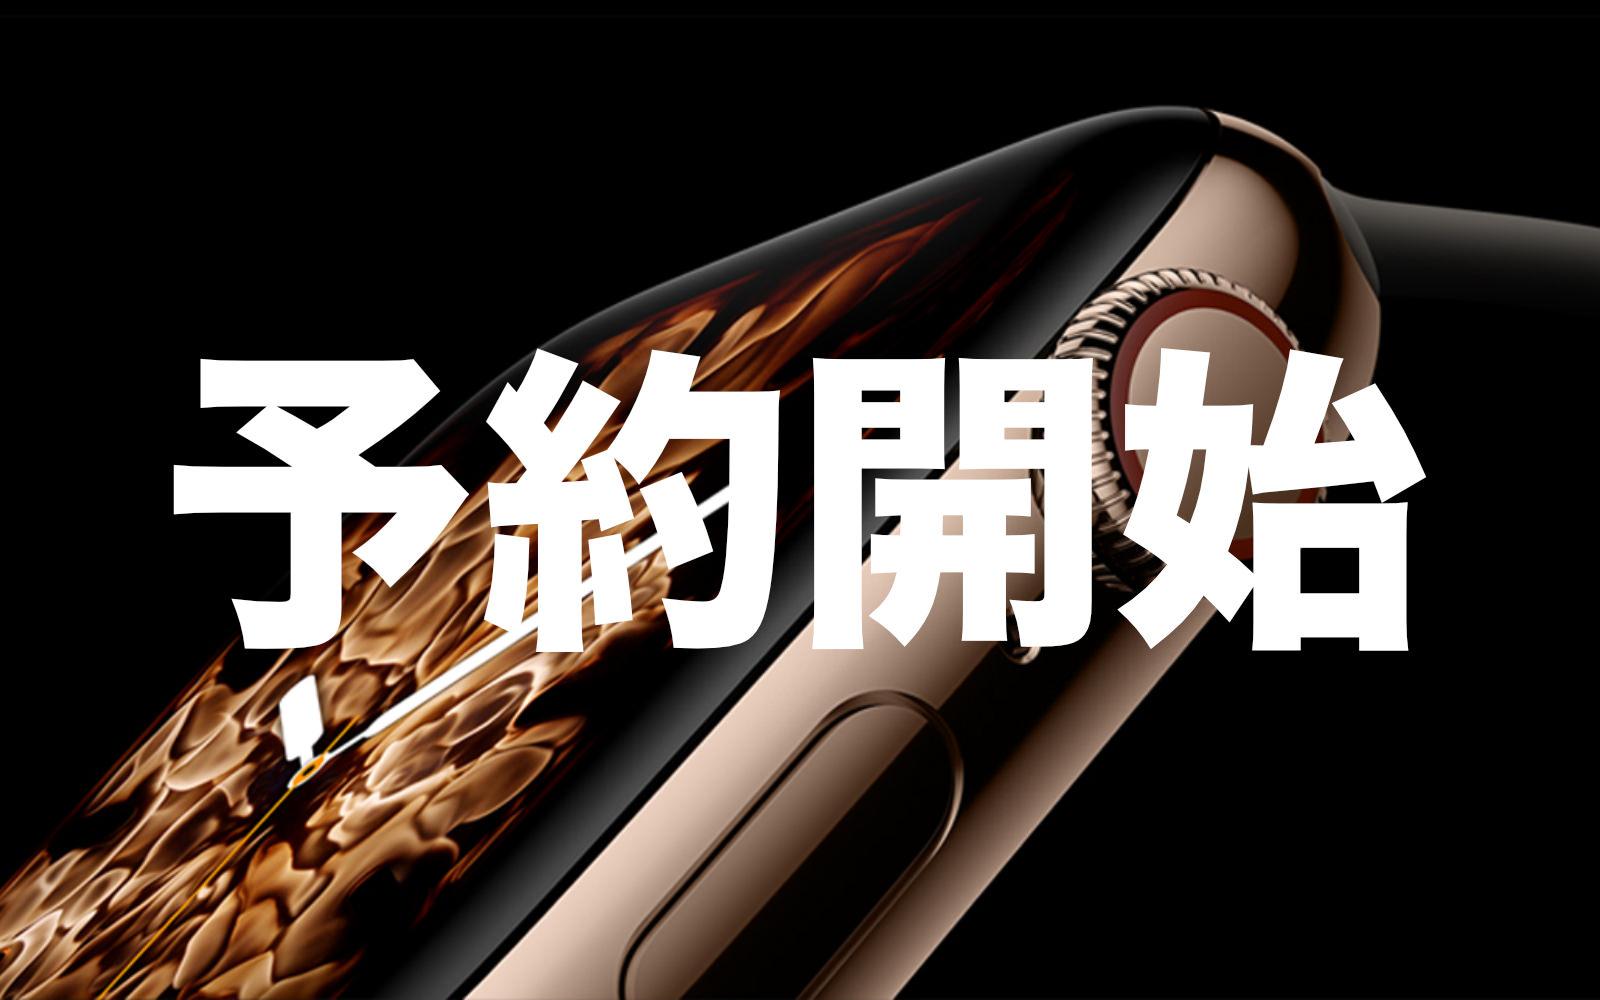 Apple watch series 4 preorder